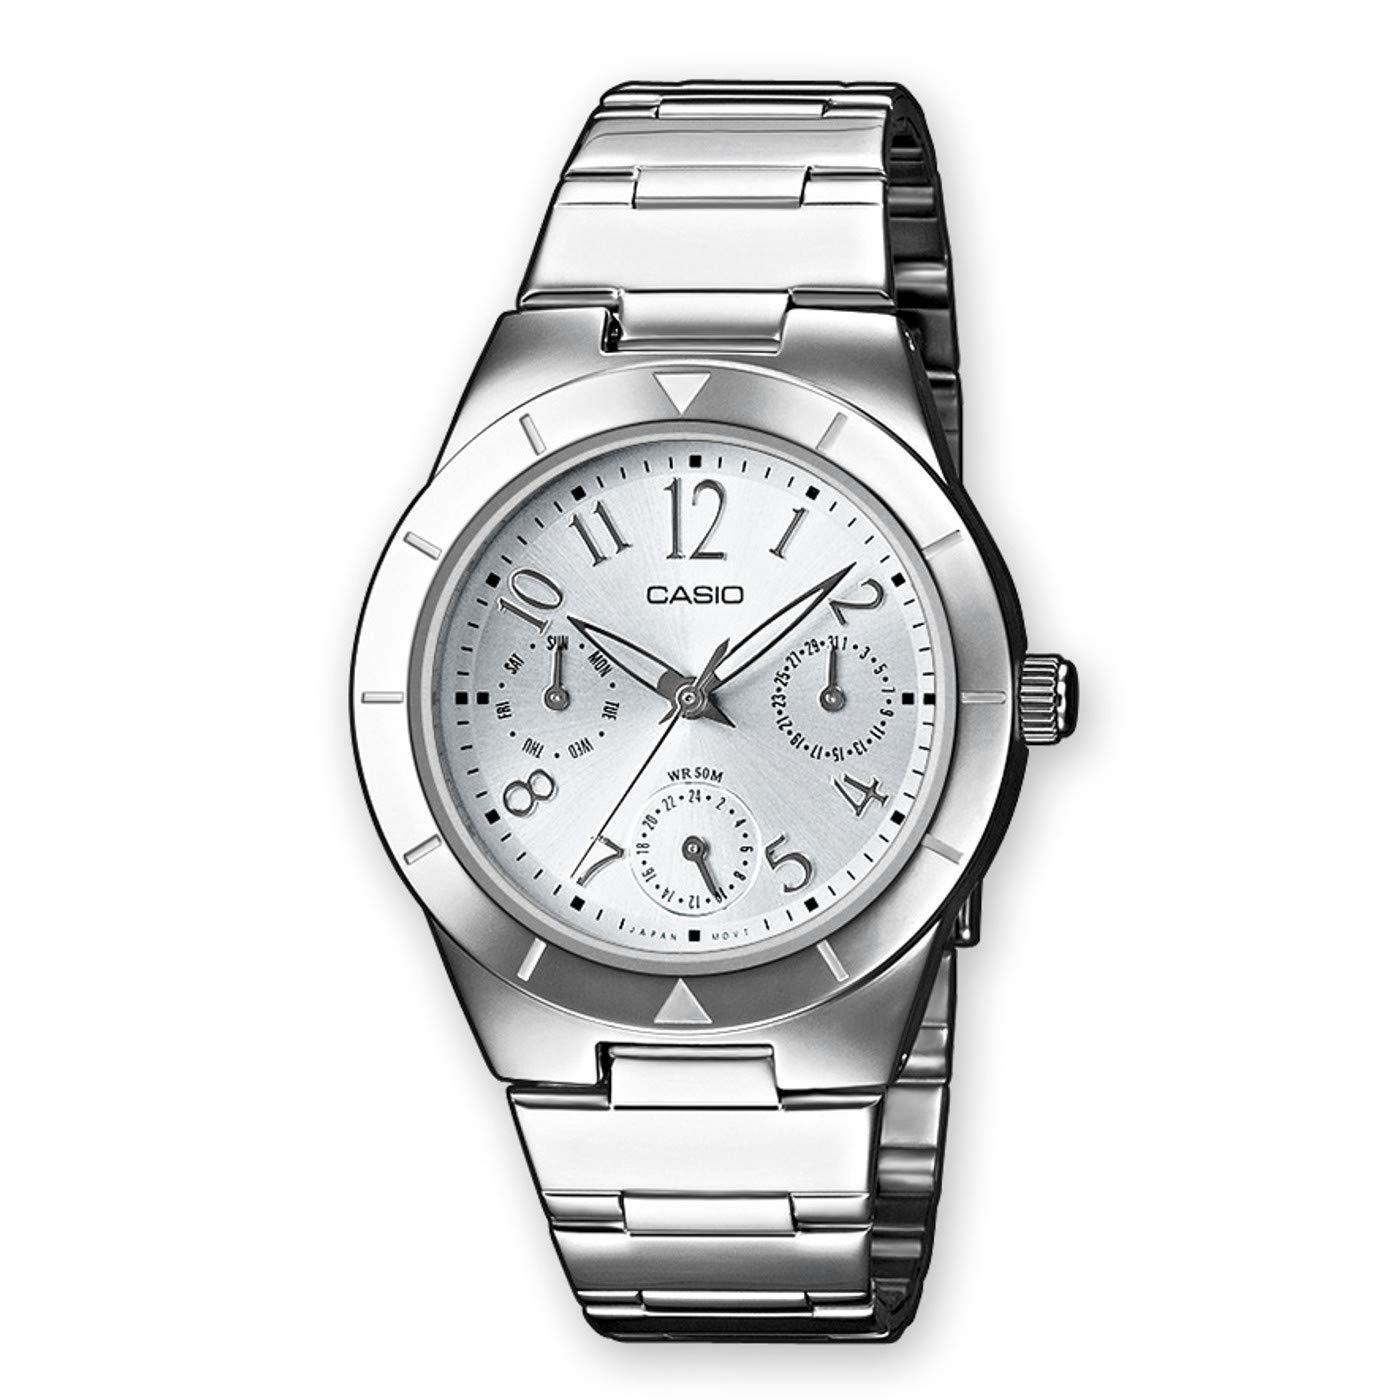 Amazon.com: Señoras reloj Casio ltp-2069d-2 a2vef: Watches